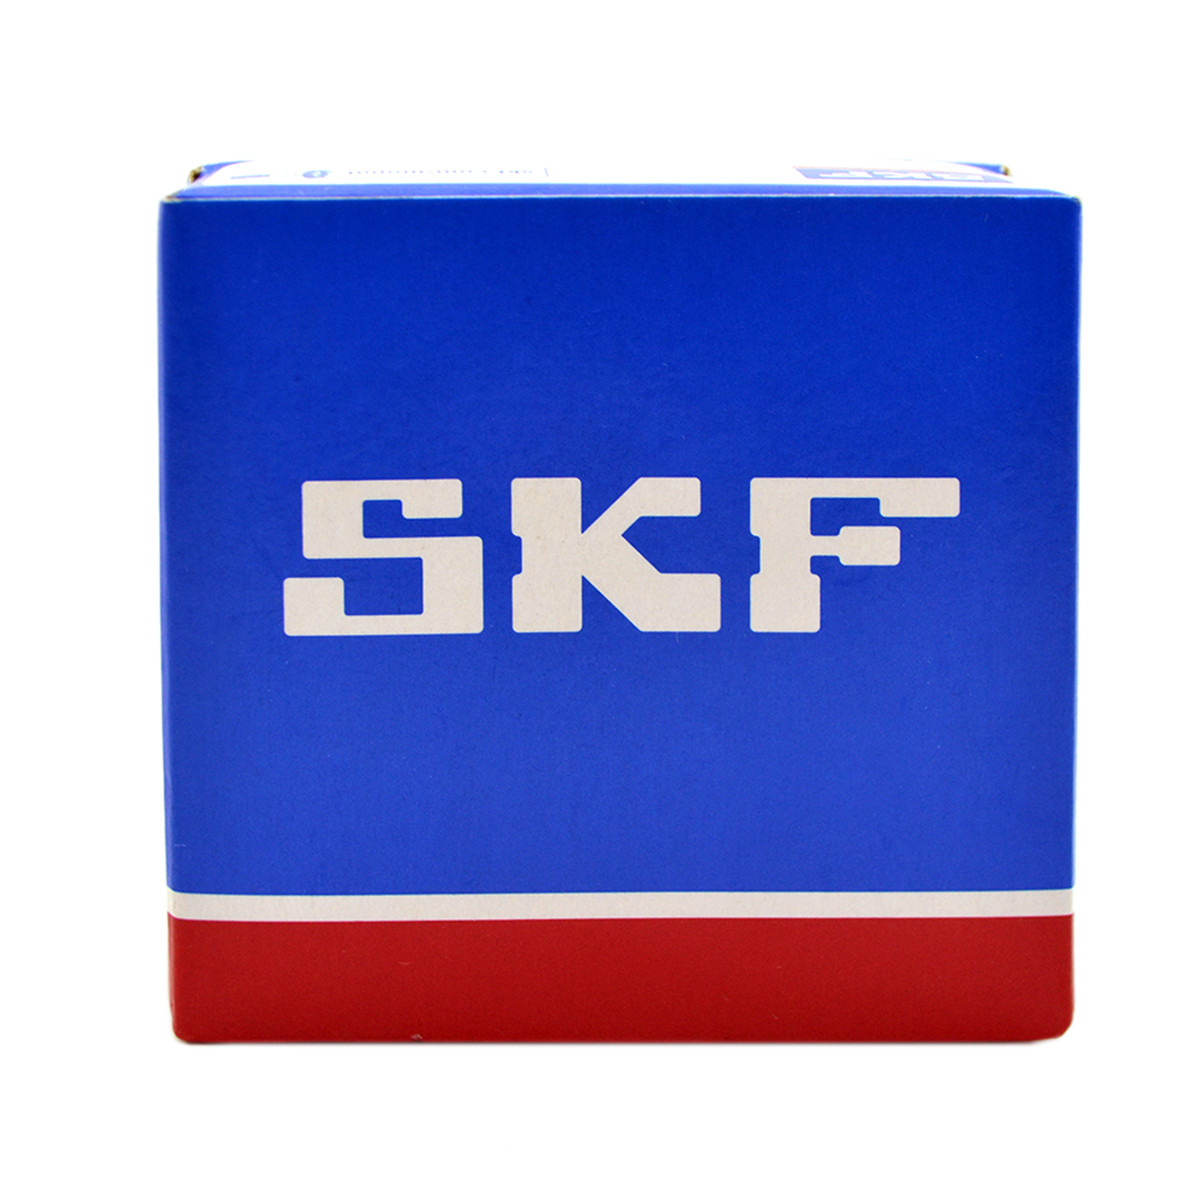 Подшипник SKF 206 zz (Фирменная упаковка)